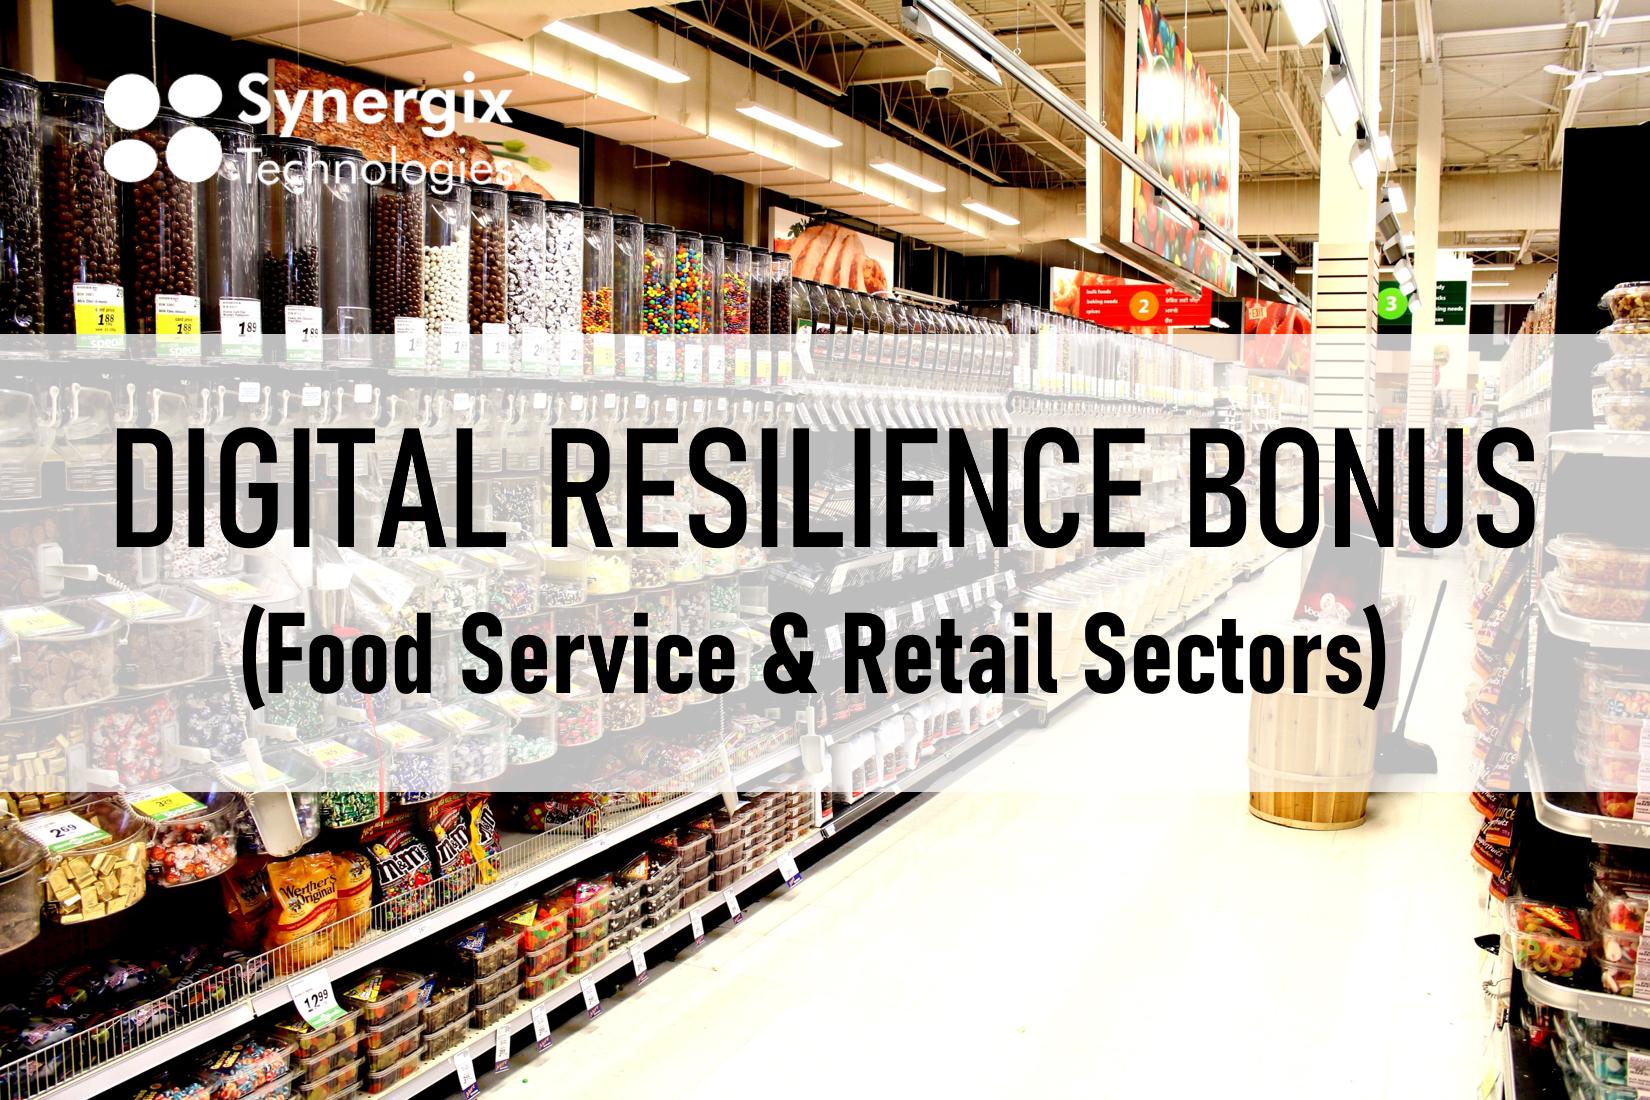 Digital Resilience Bonus - ERP system